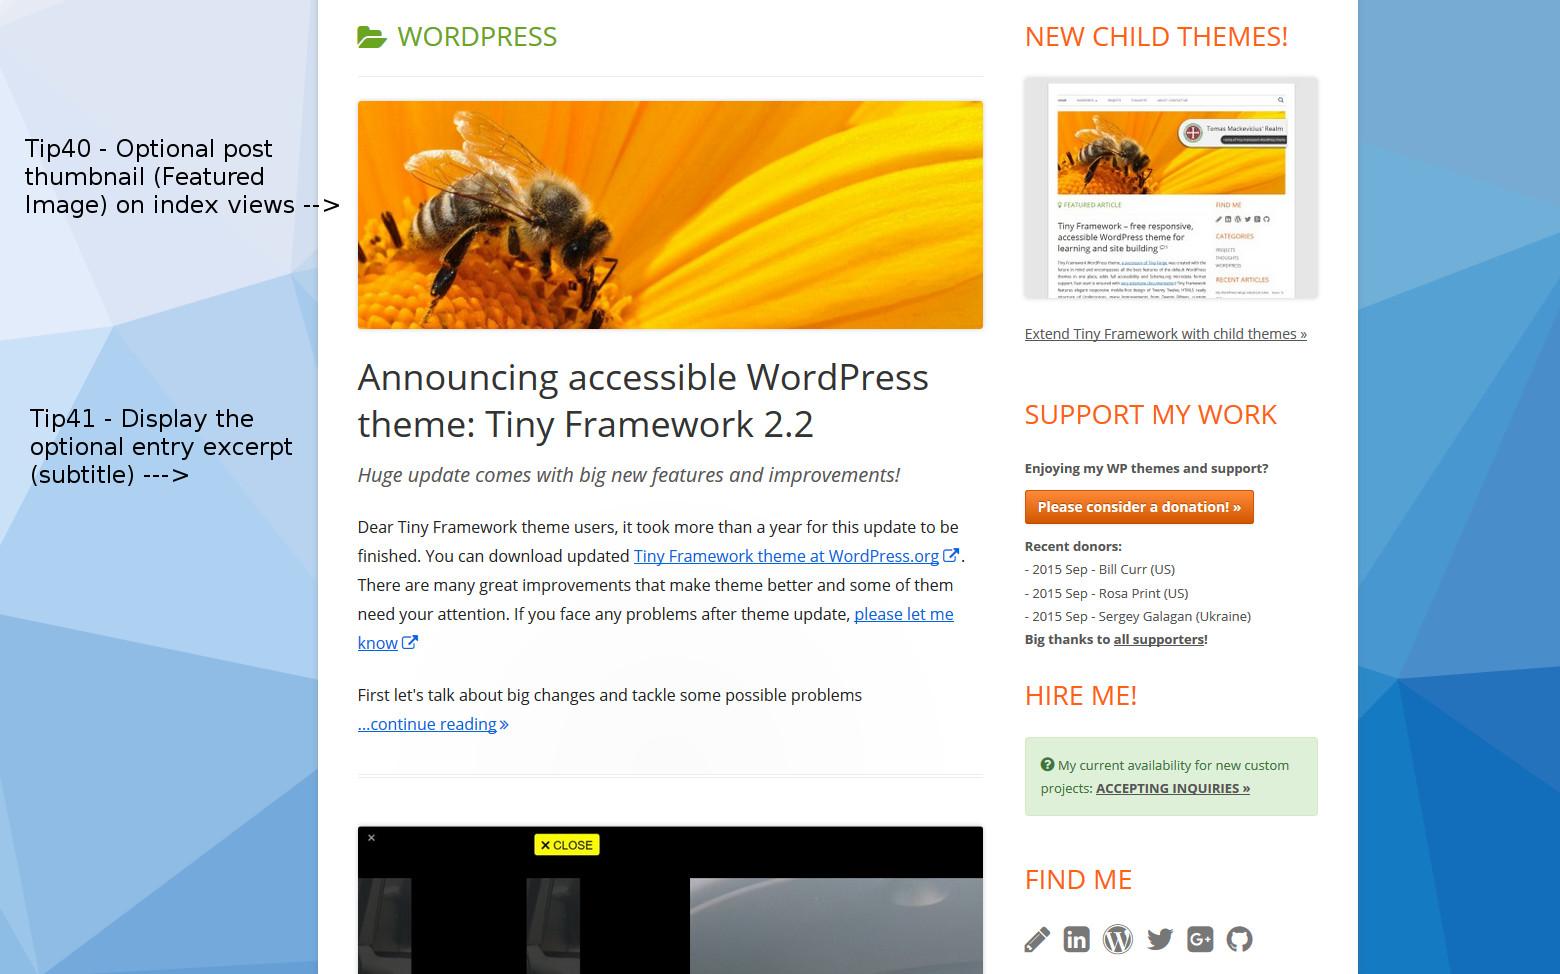 Tiny Framework - Tip40 and Tip41